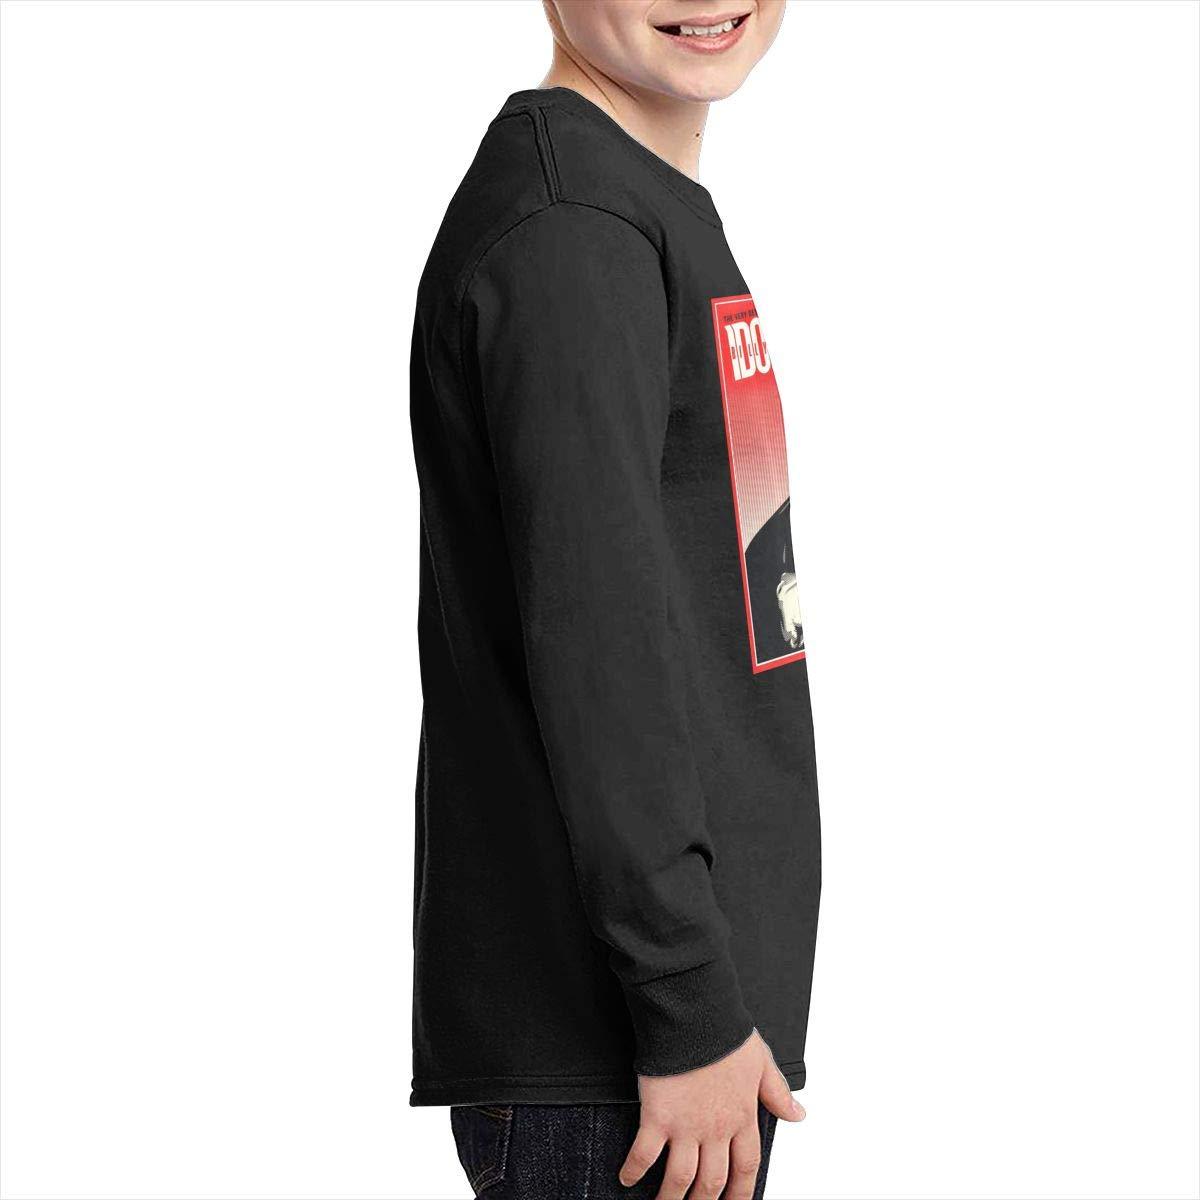 TWOSKILL Youth Billy Rebell Yell Idol Long Sleeves Shirt Boys Girls